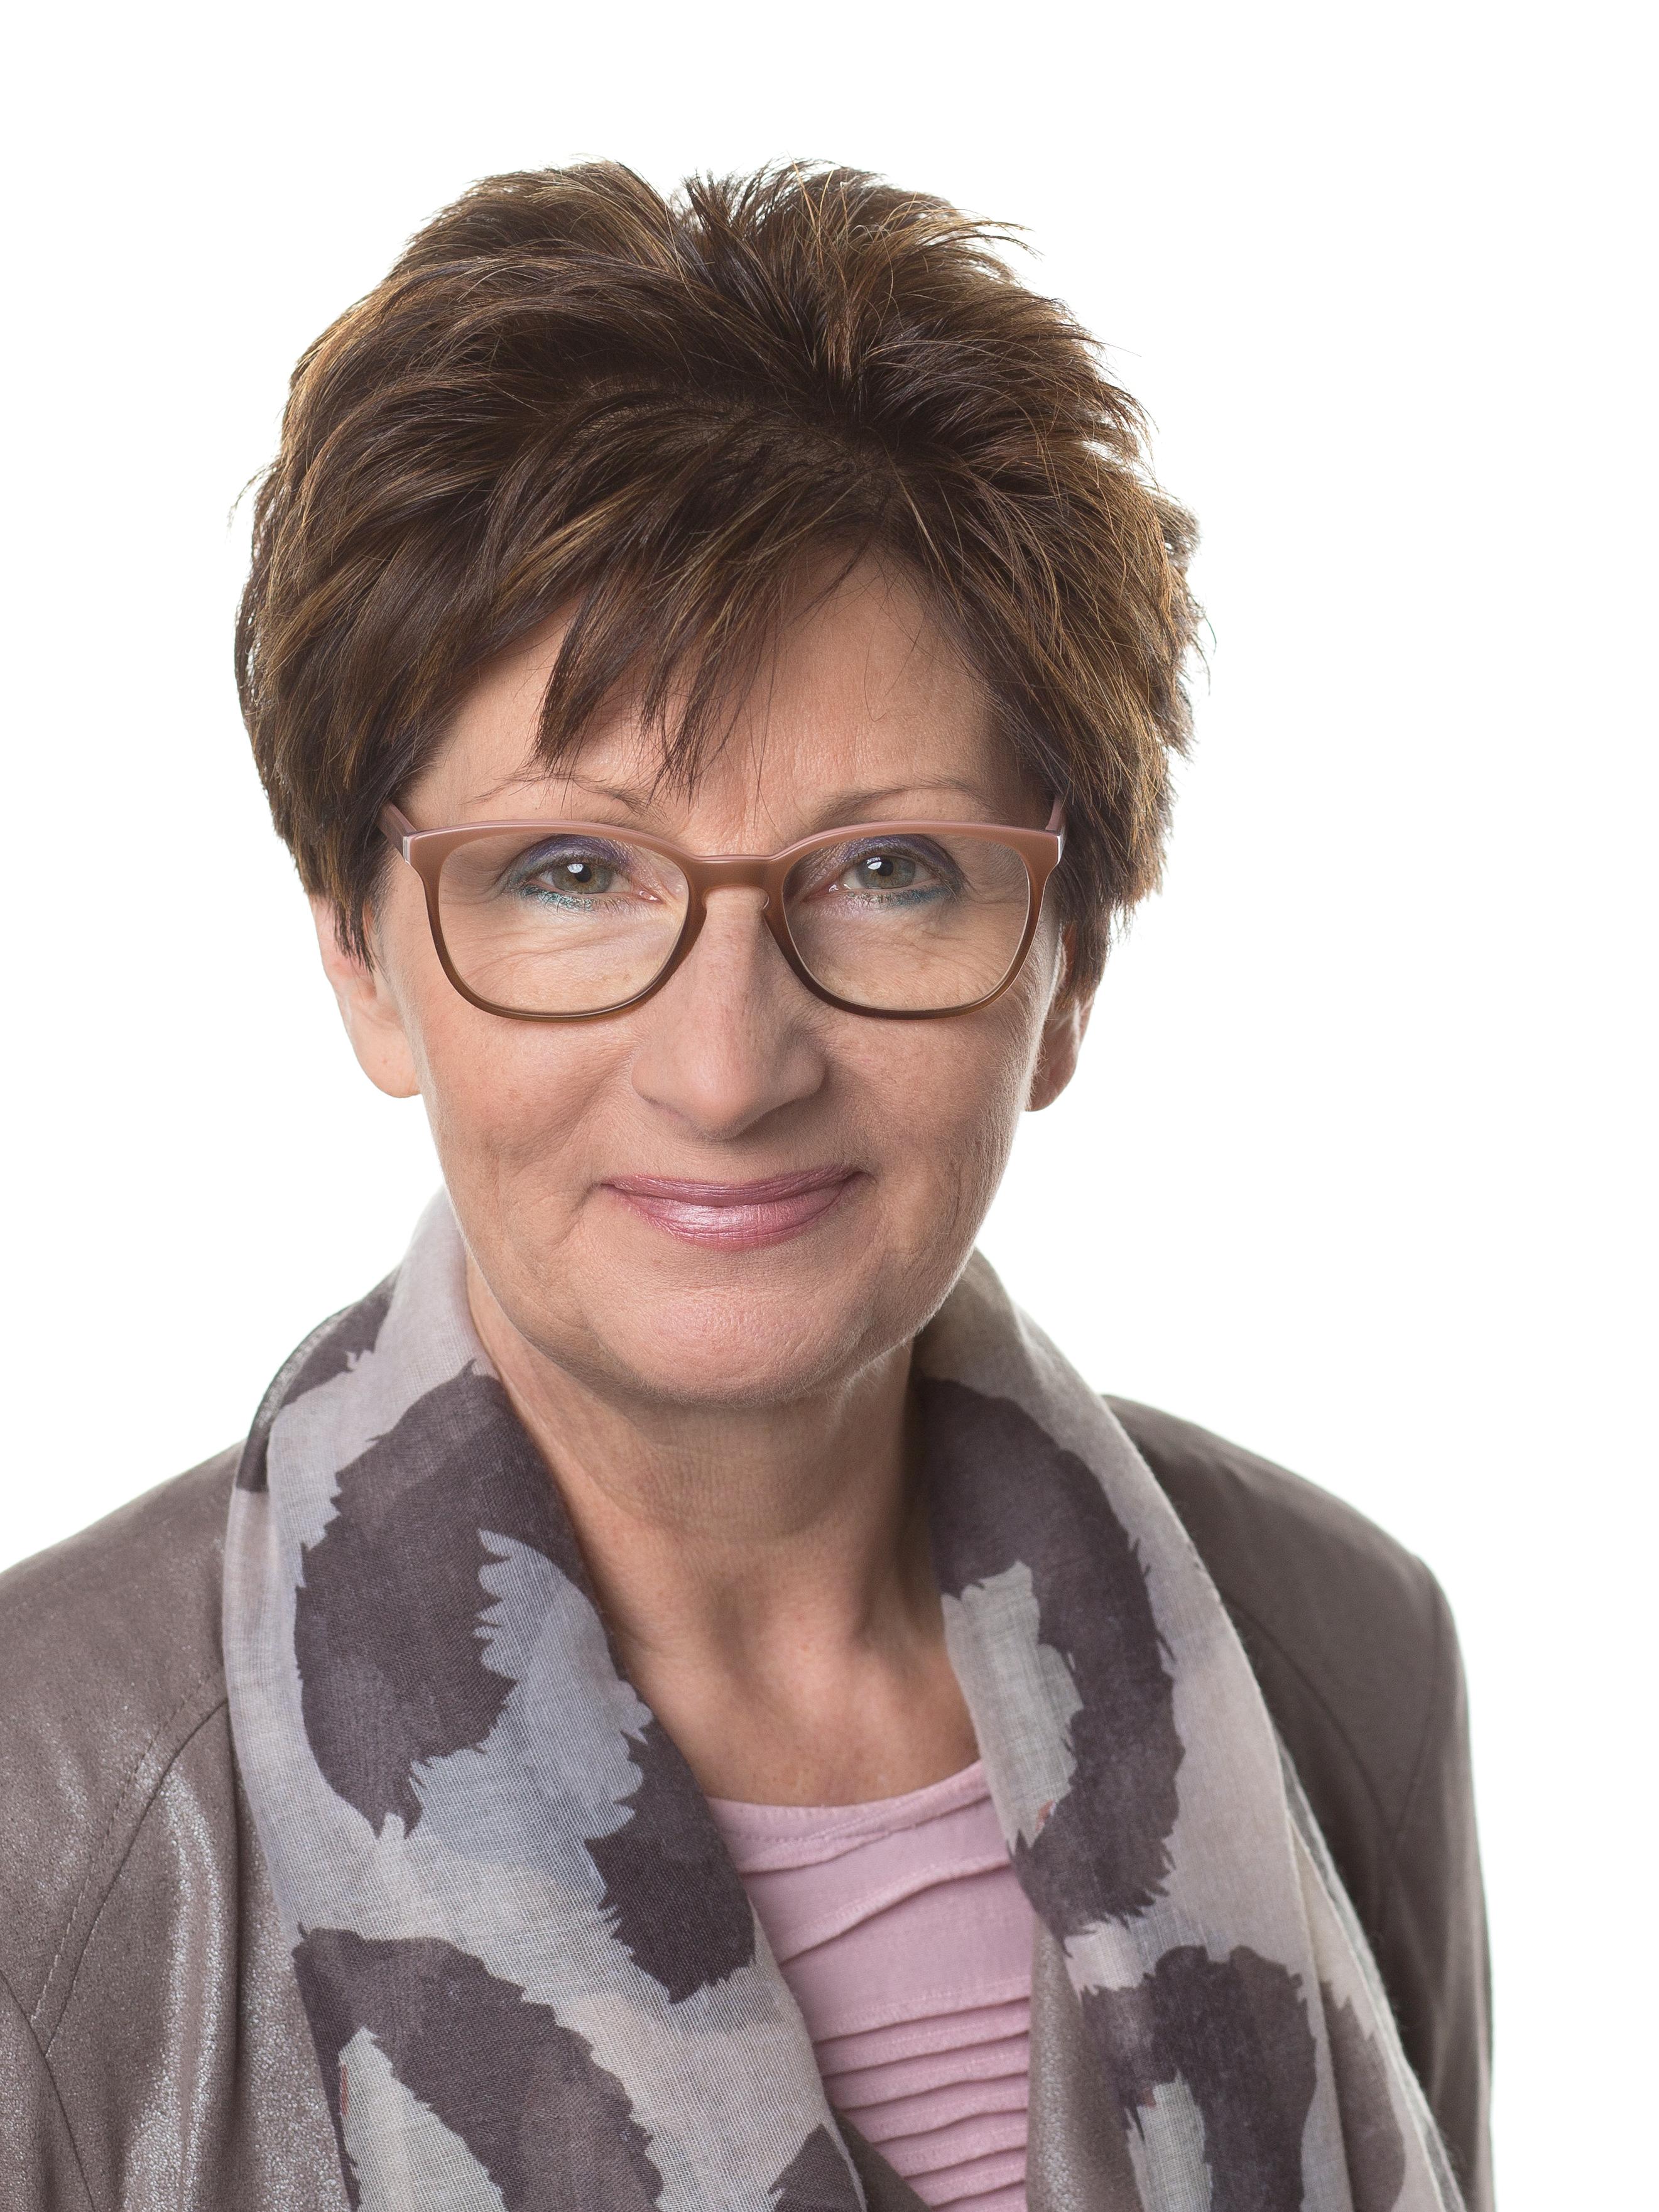 Jolanda Meijer